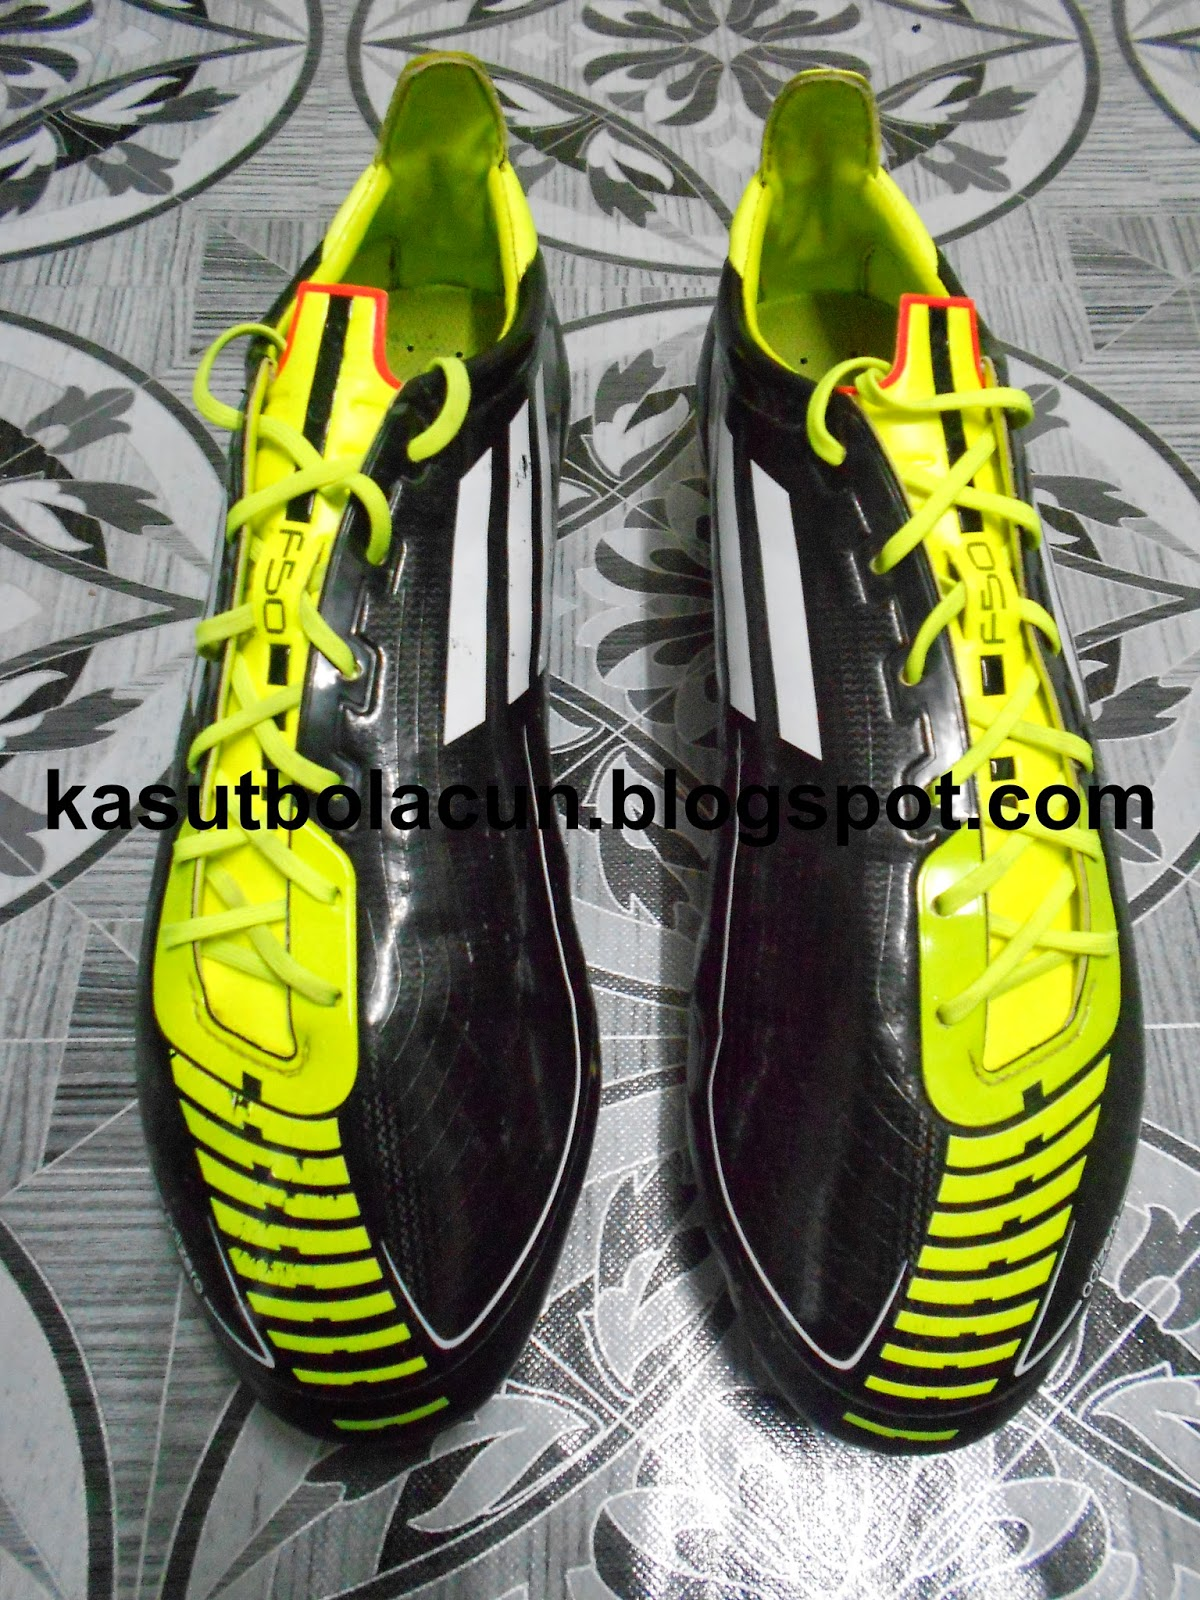 http://kasutbolacun.blogspot.com/2014/10/adidas-f50-adizero-2-sg_18.html